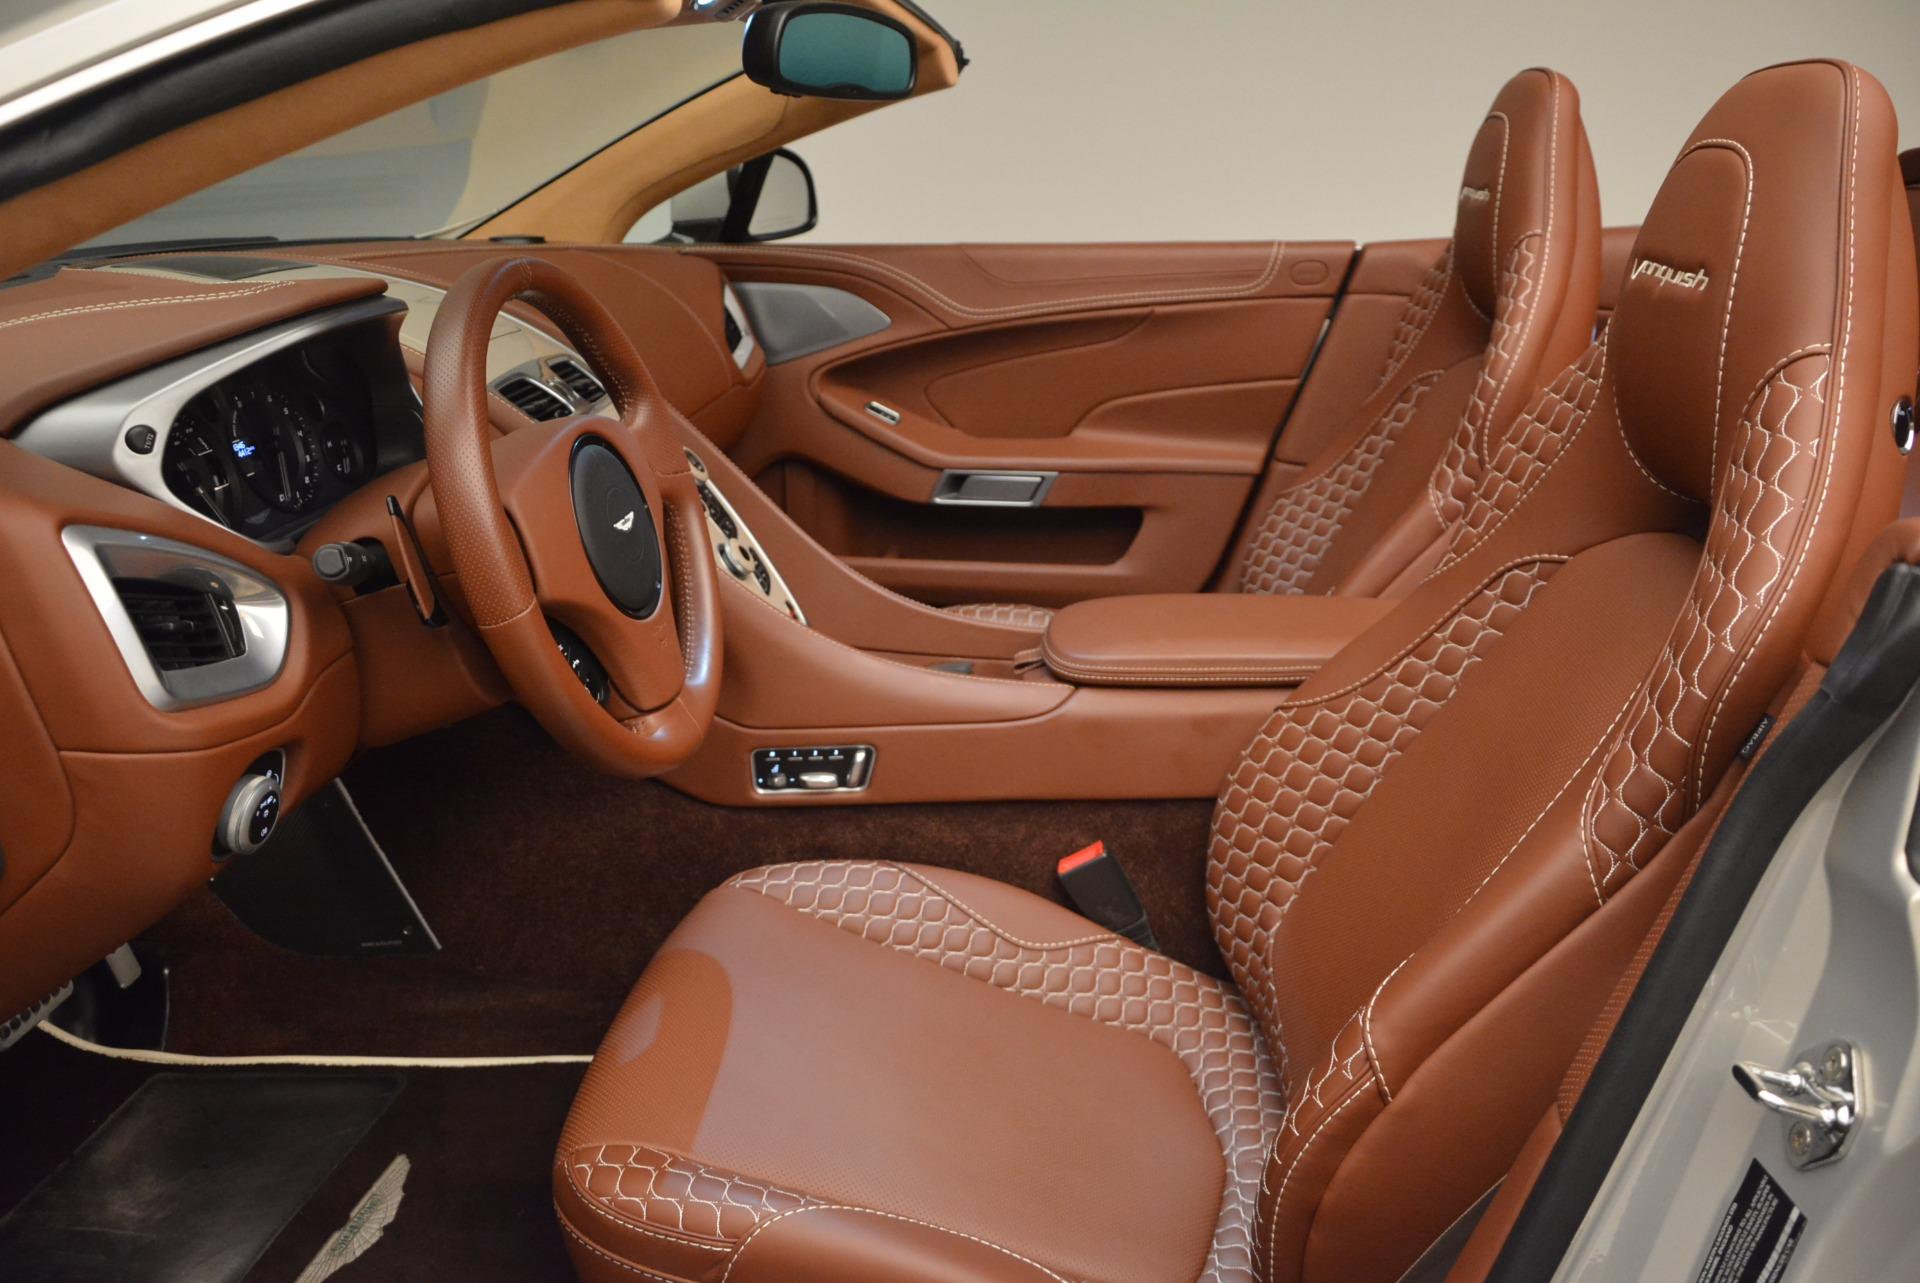 Used 2015 Aston Martin Vanquish Volante For Sale In Greenwich, CT 1448_p20